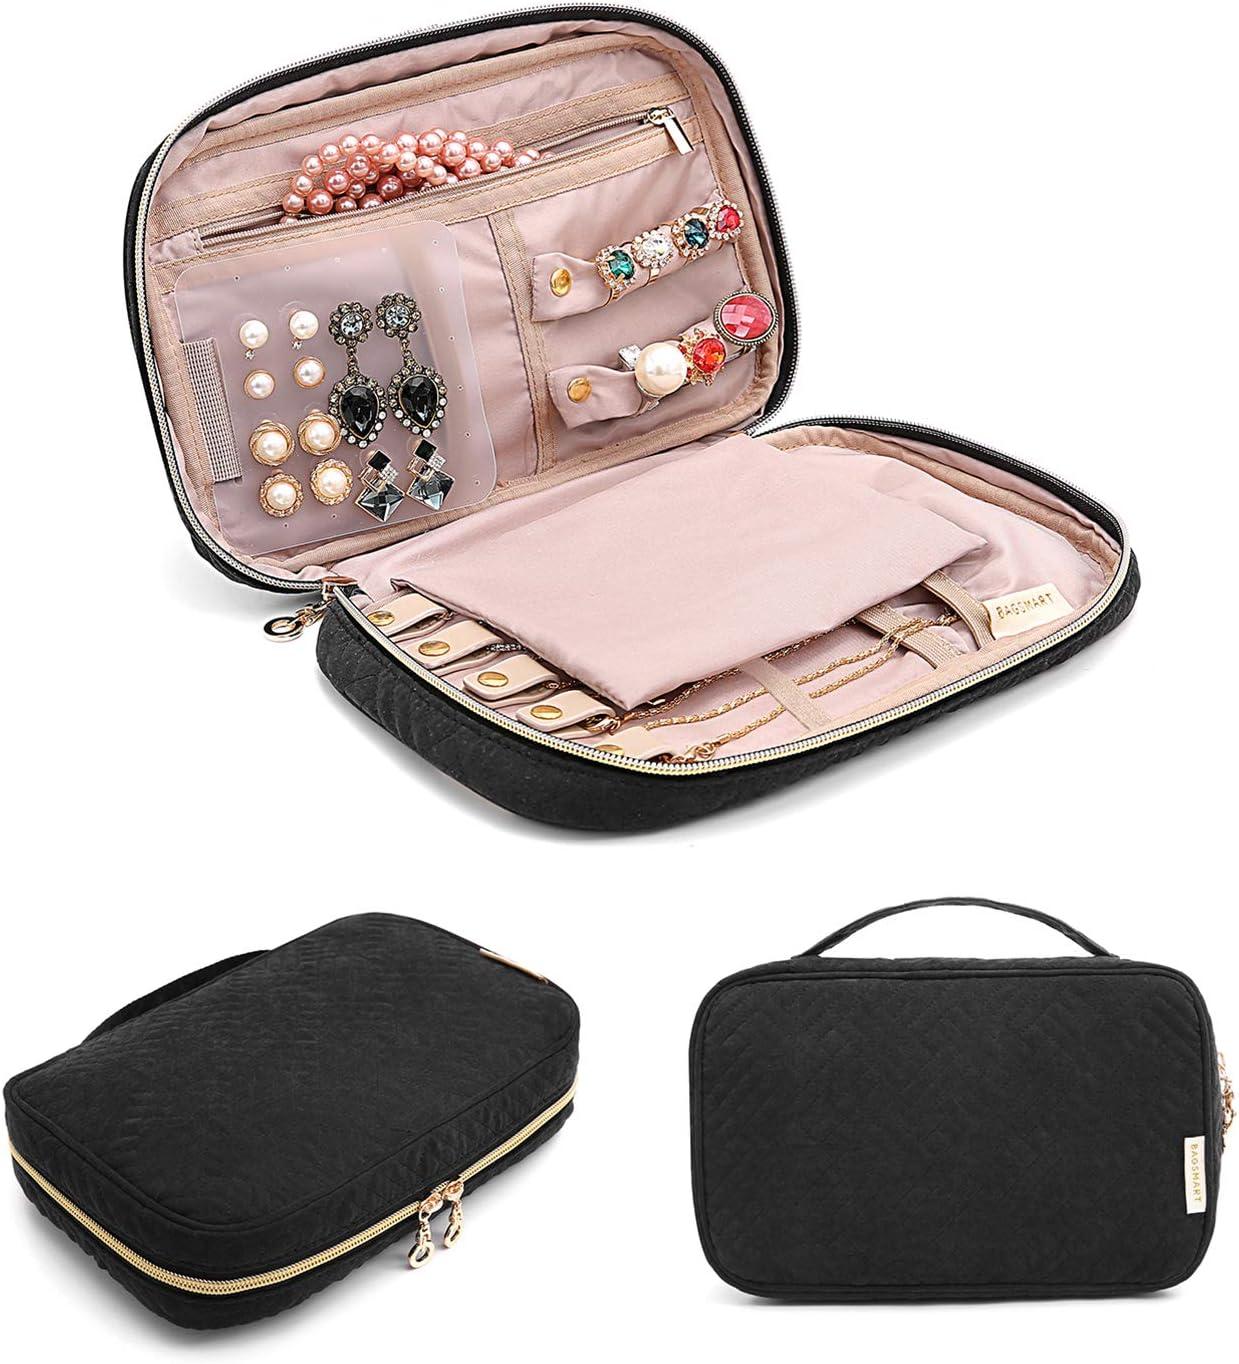 small jewellery bag with chain Jewellery bag security chain jewel bag travel bag organizer jewelry